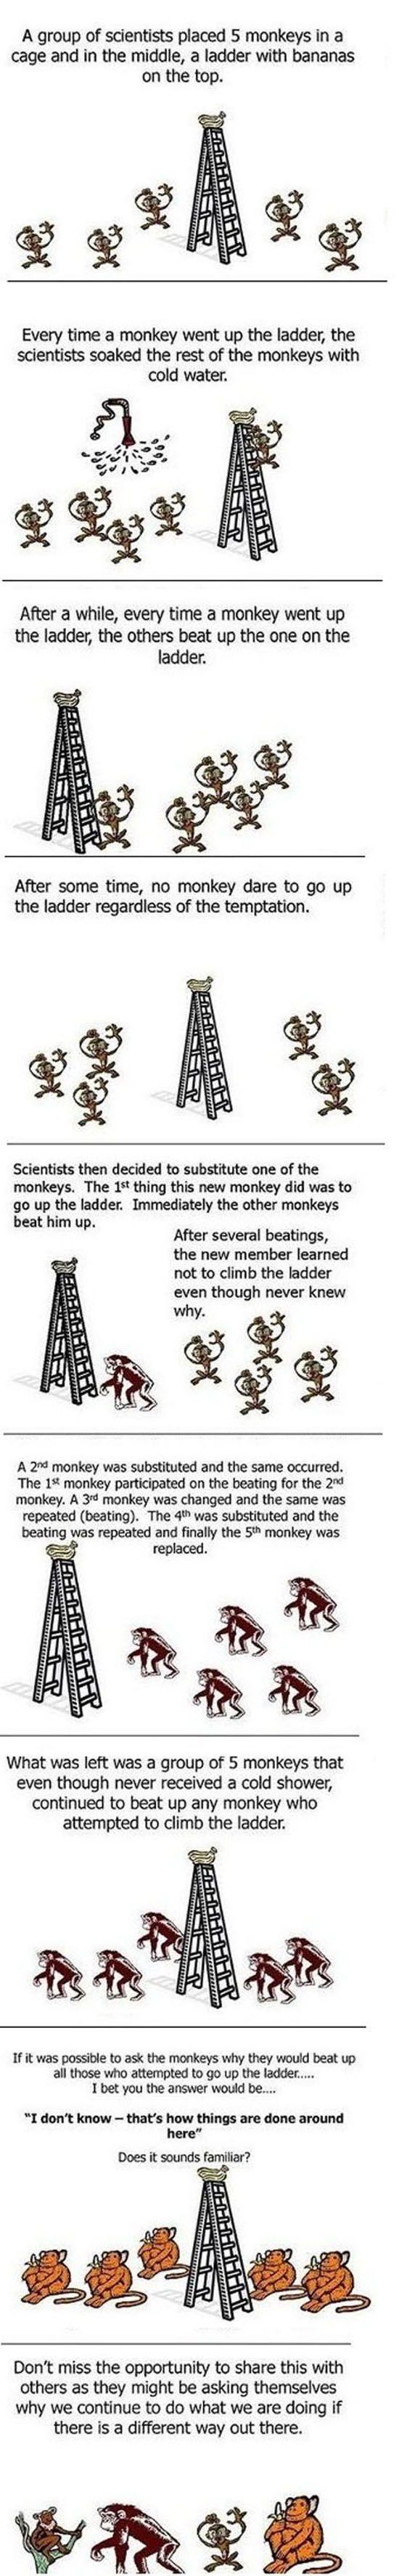 Five Monkeys (7 pics)